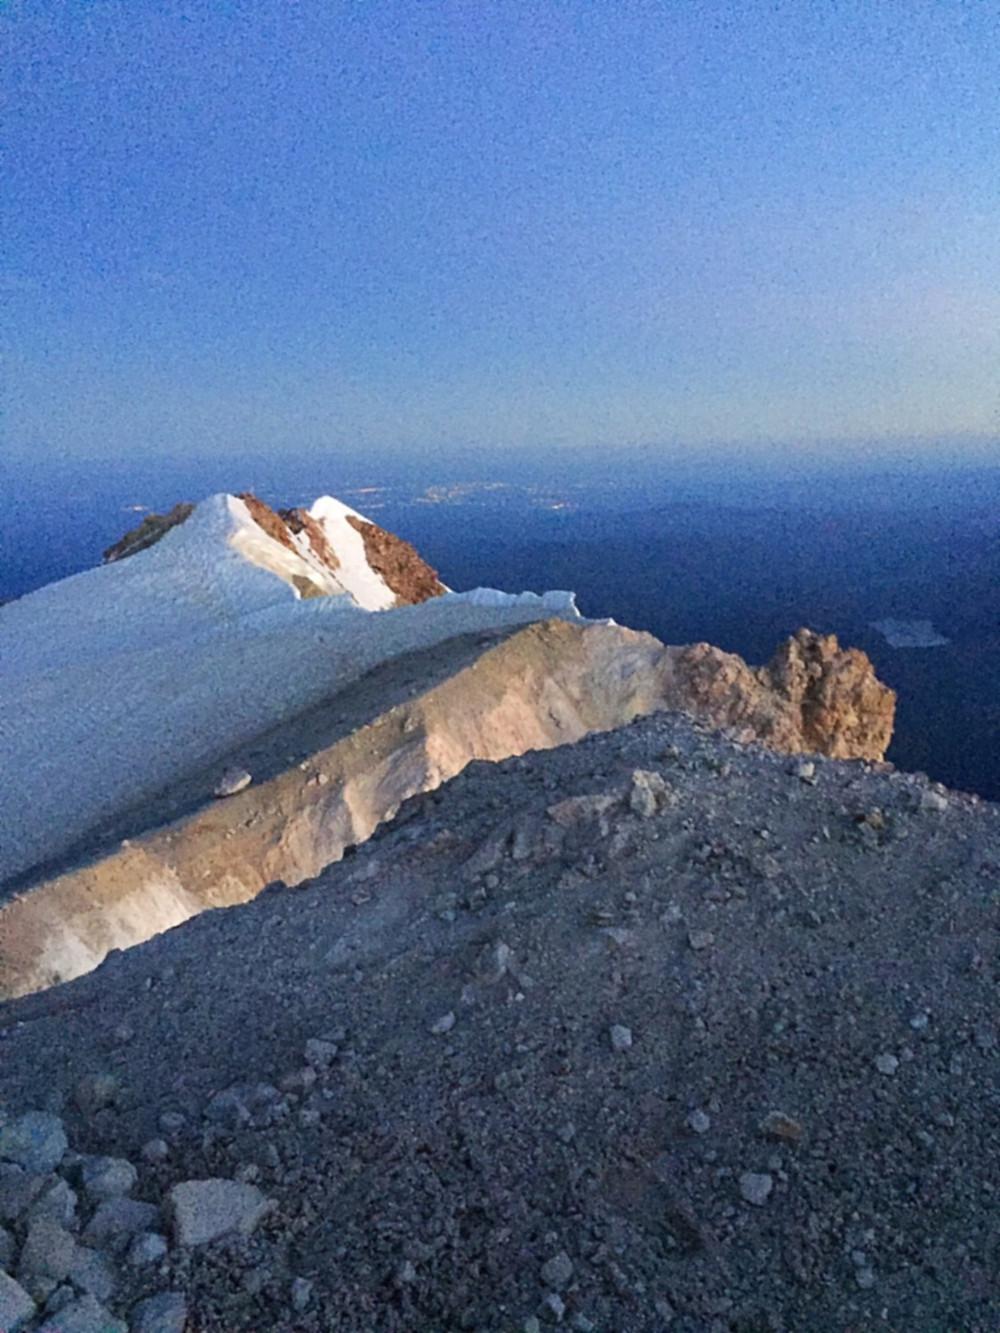 Mt. Hood and Portland